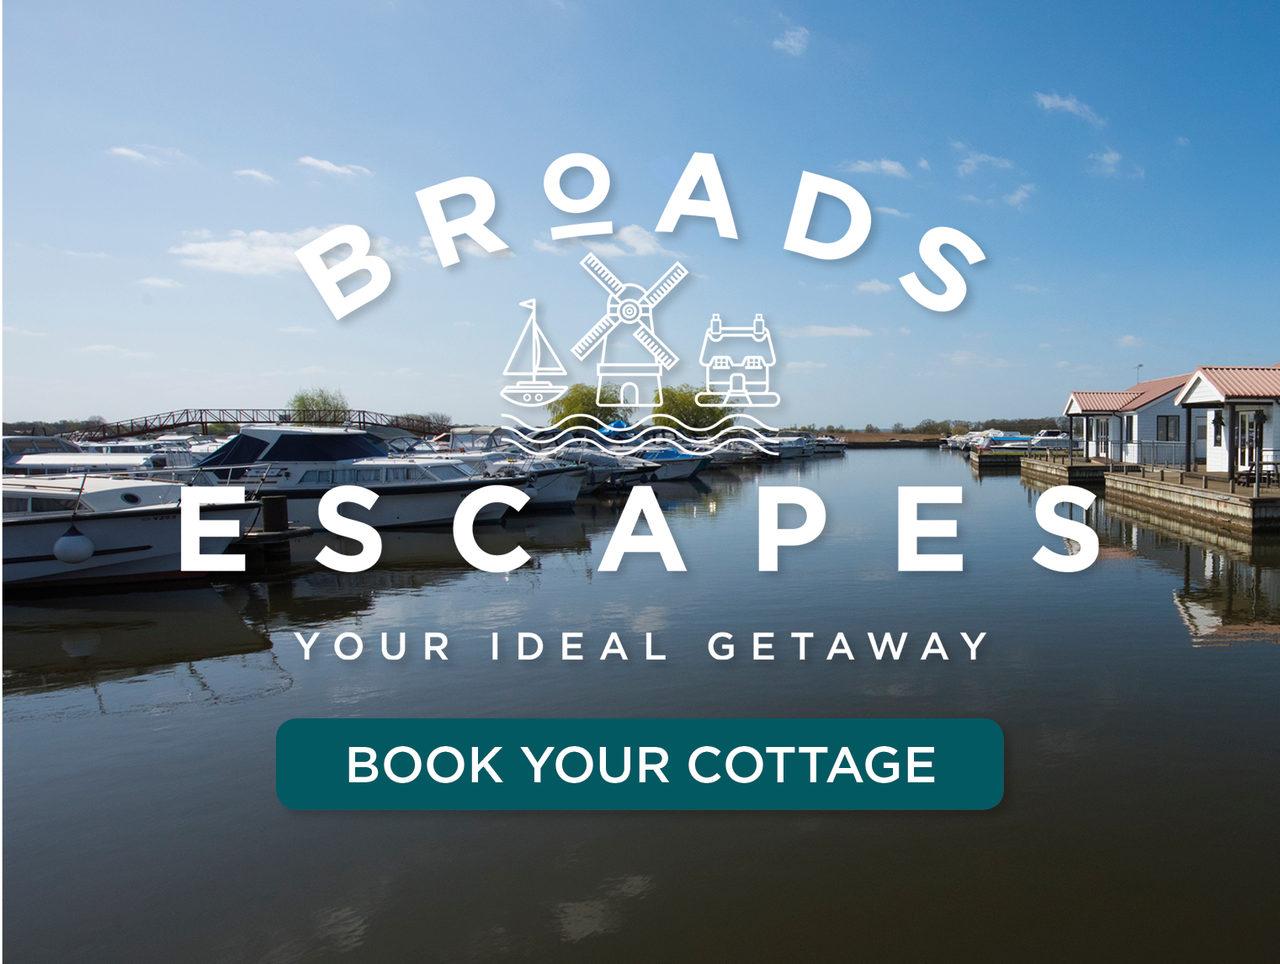 Broads Escapes Cottage Banner 730 X 550